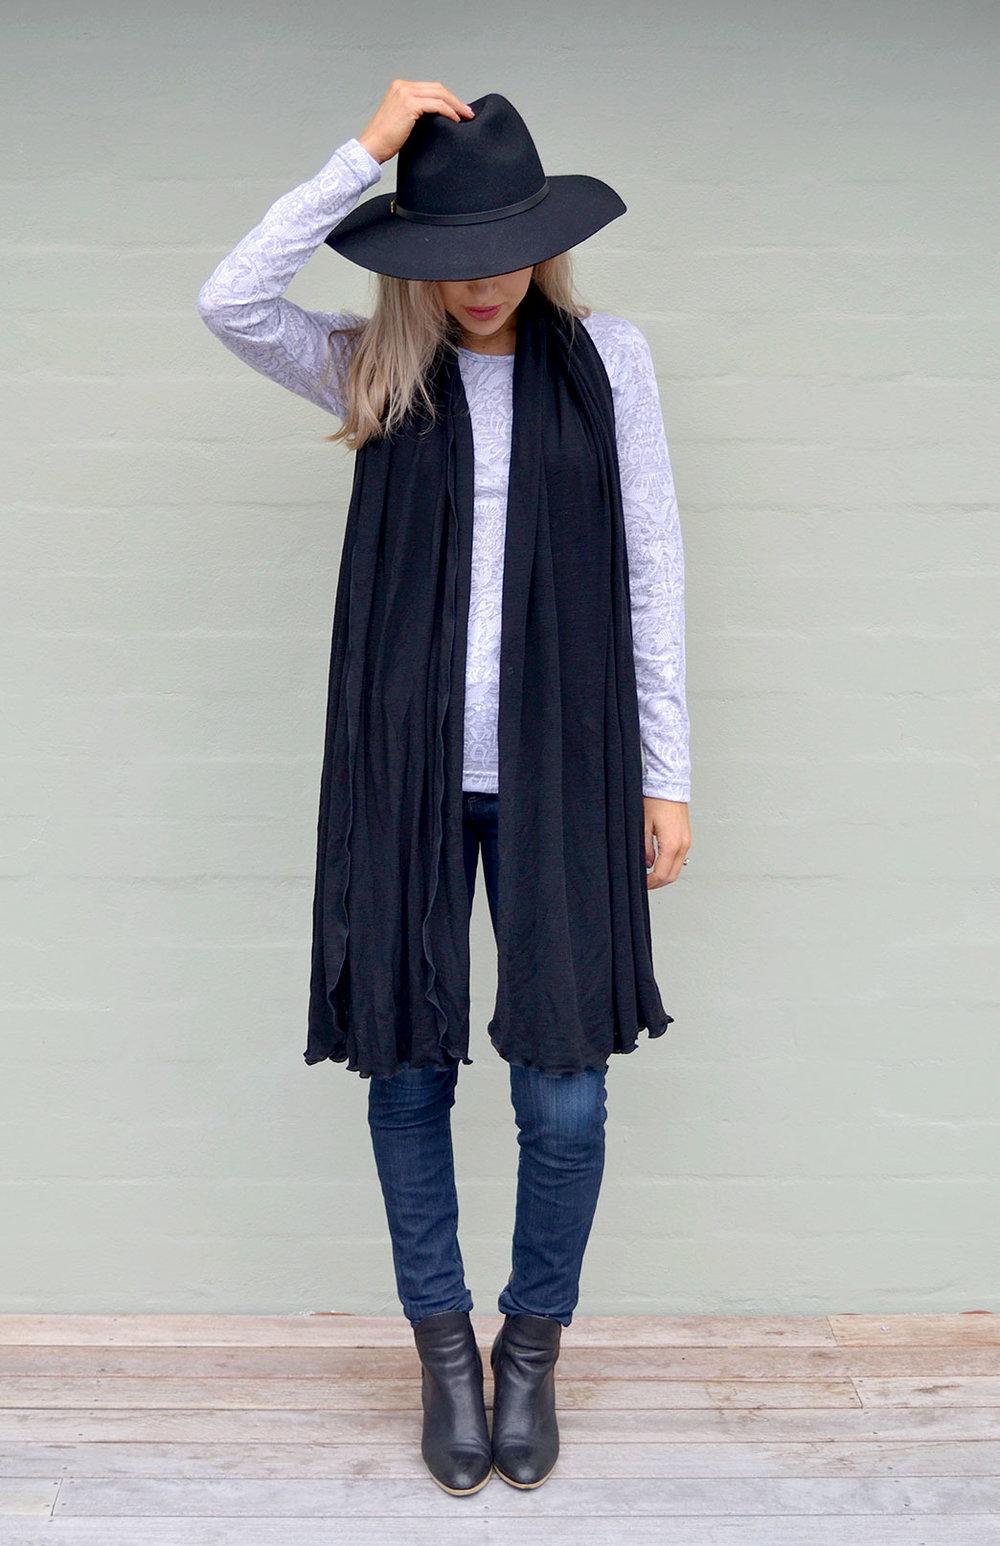 8404-wide-merino-scarf-black-new-0.jpg